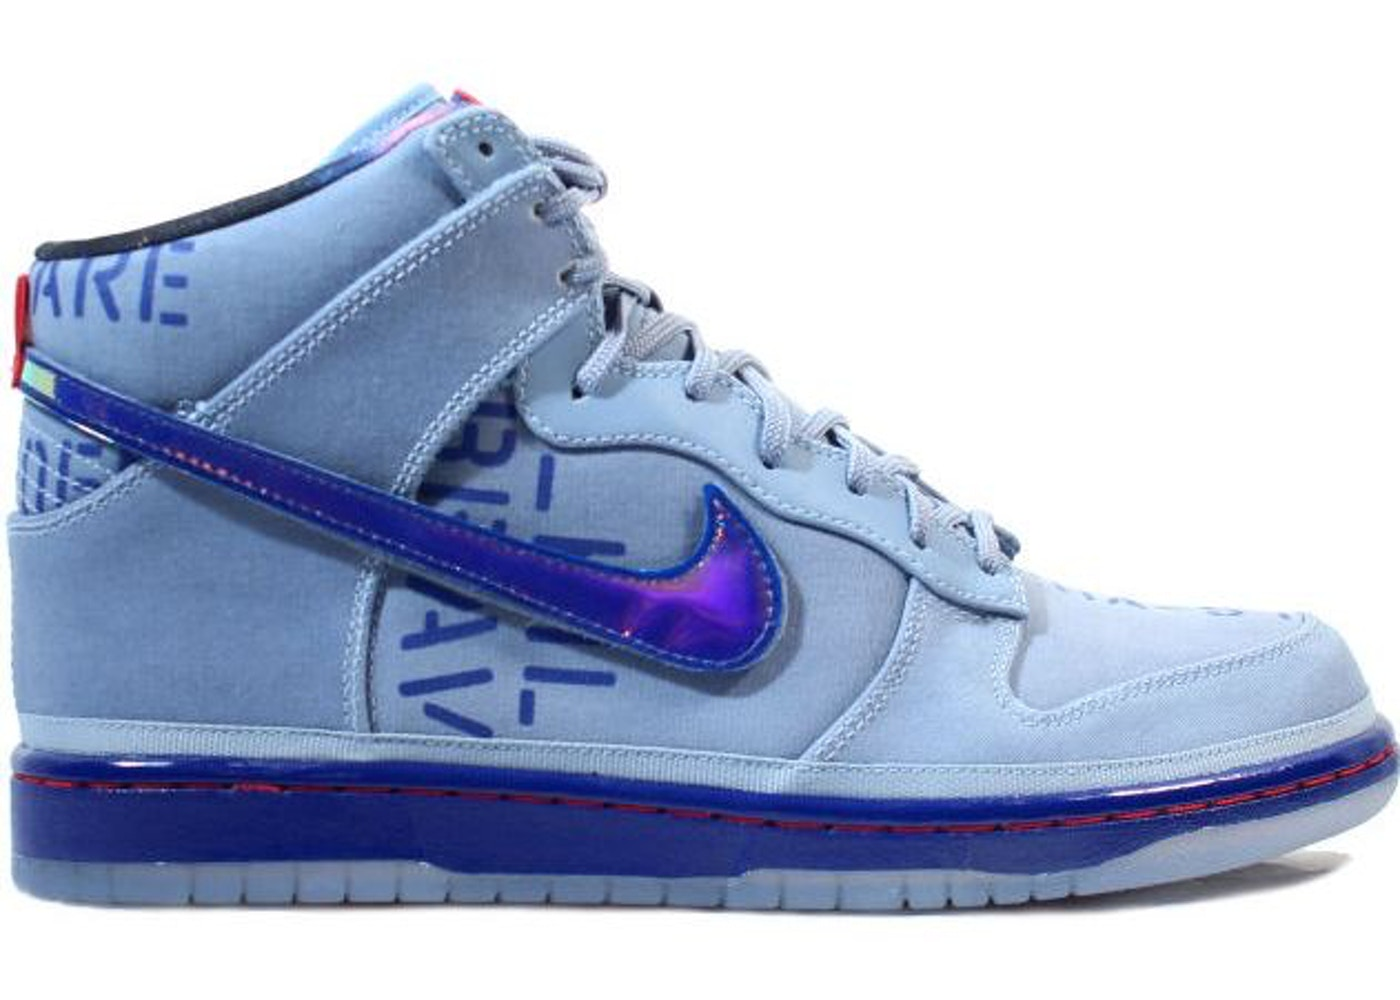 new arrival 2f155 8b64e Nike Dunk High All Star Galaxy Blue